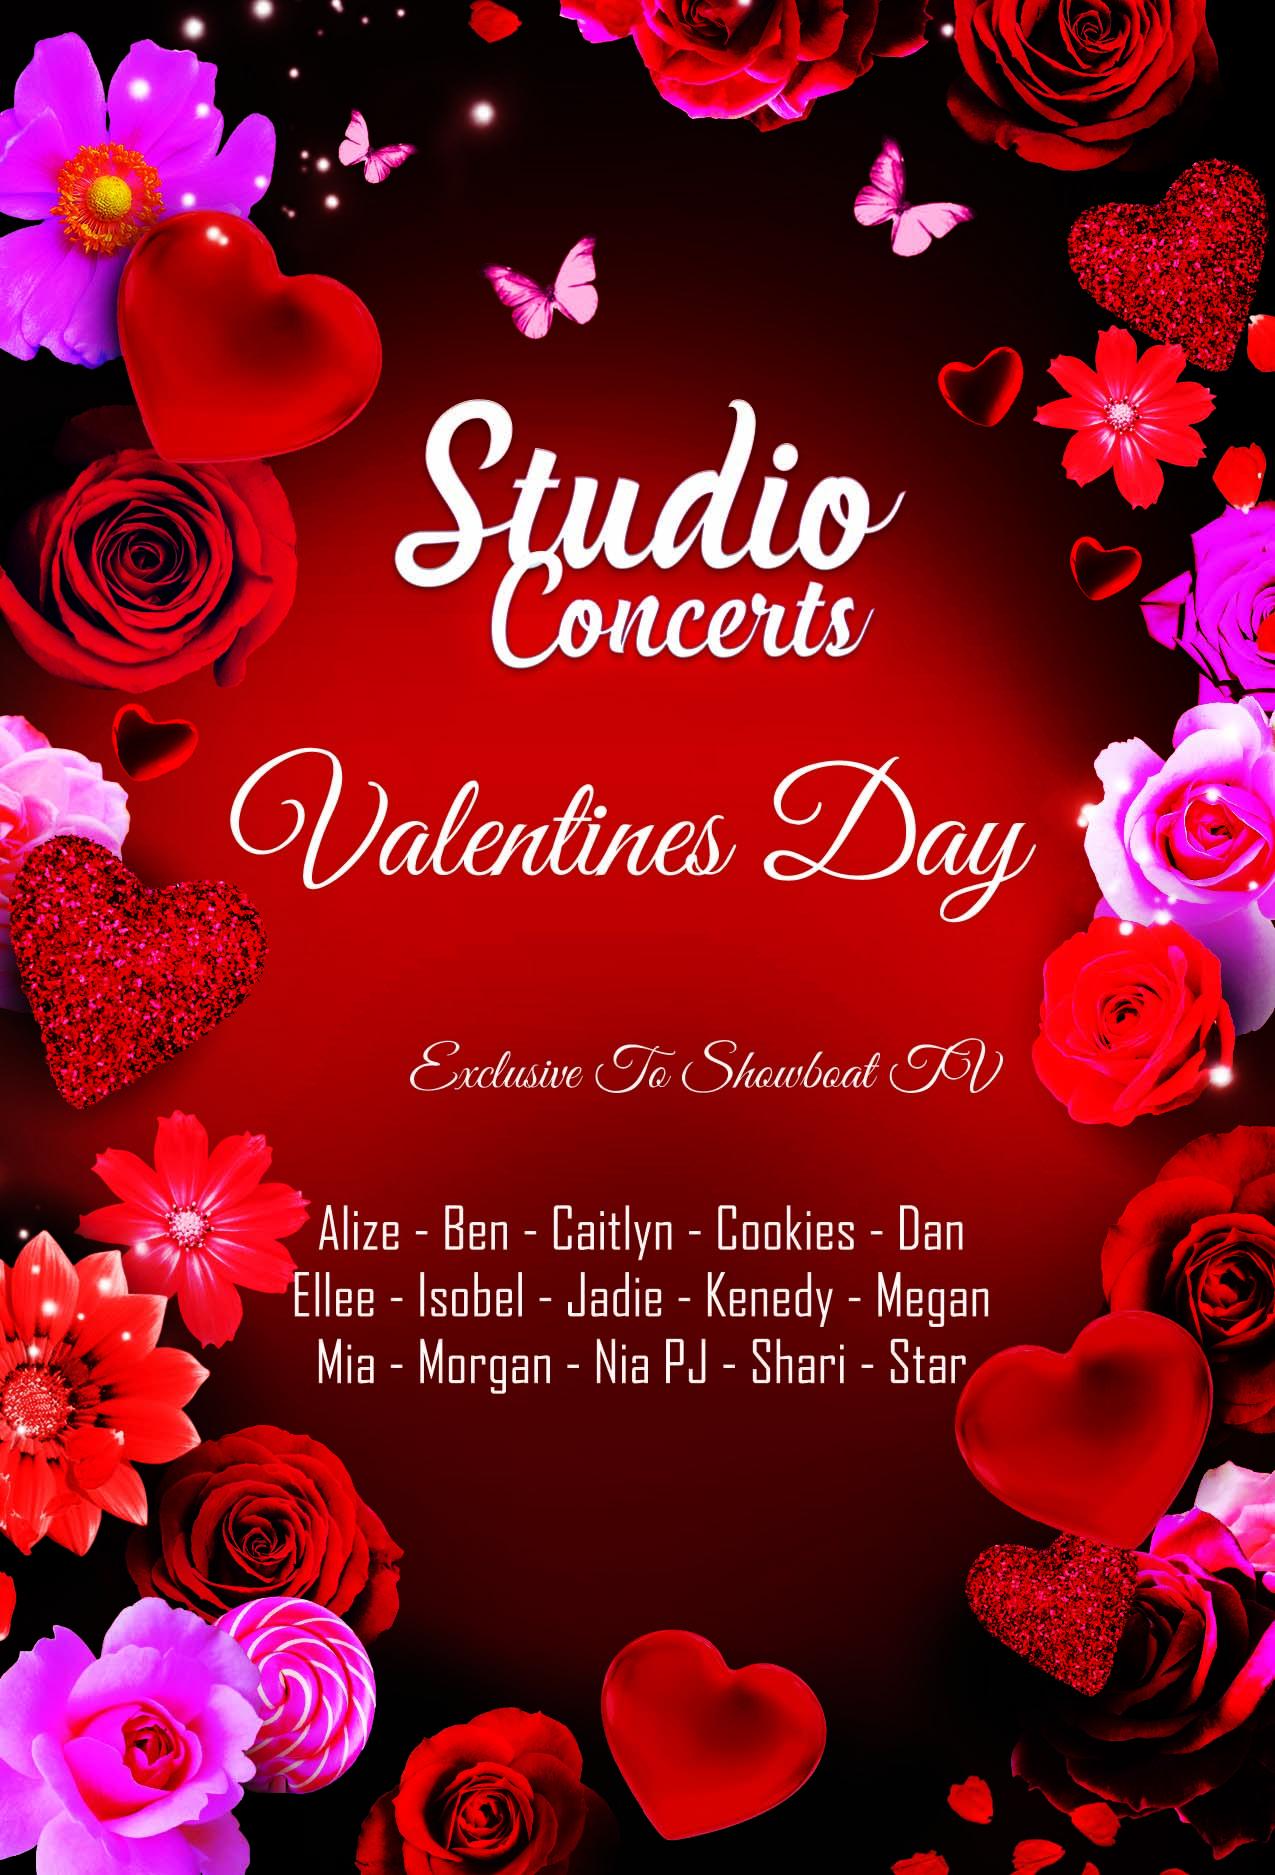 Valentines Studio Concert